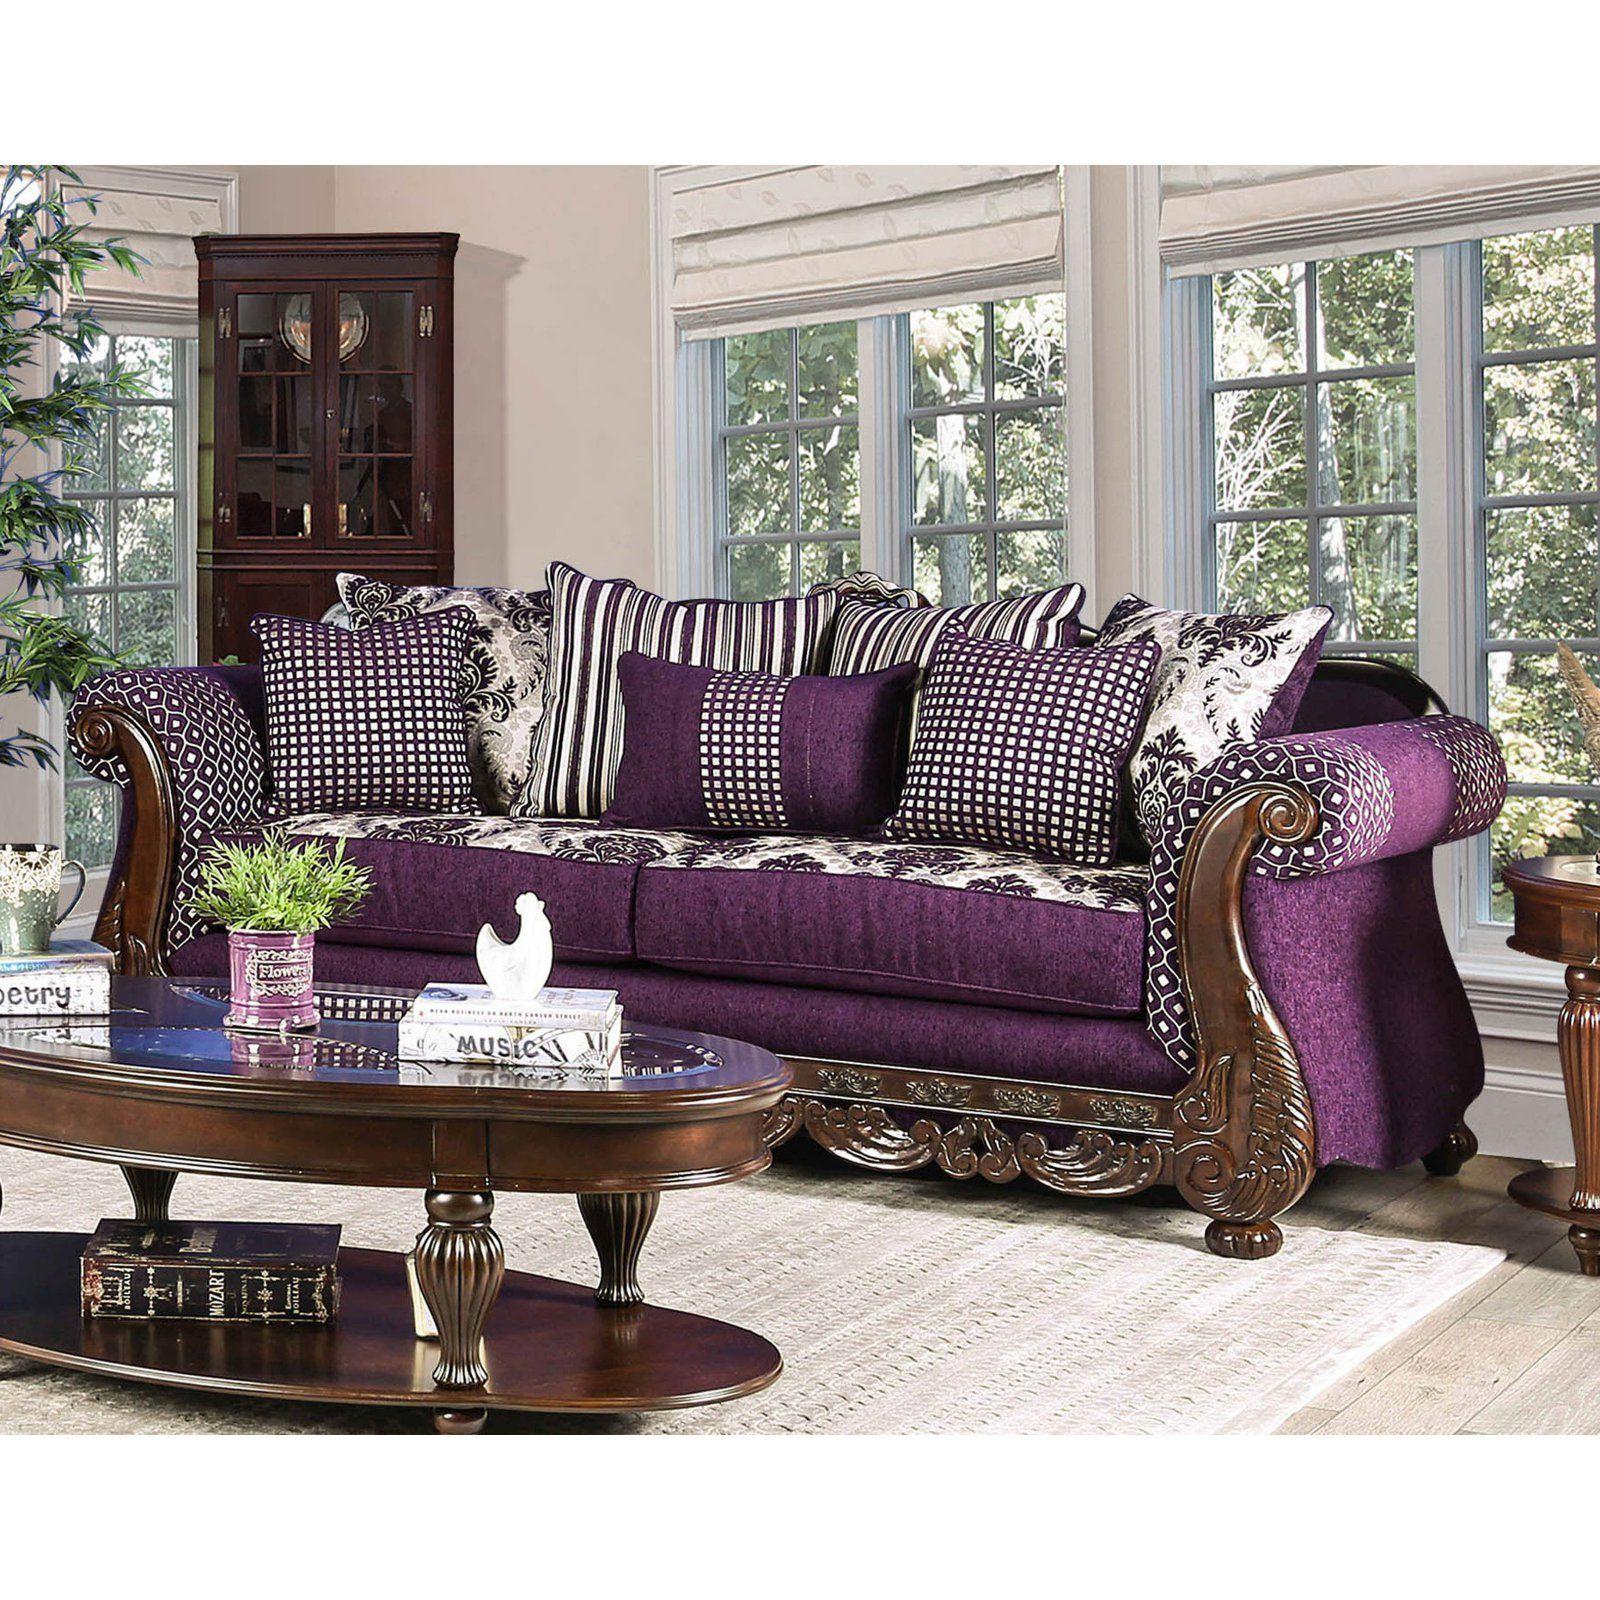 Furniture Of America Ava Traditional Sofa Furniture Of America